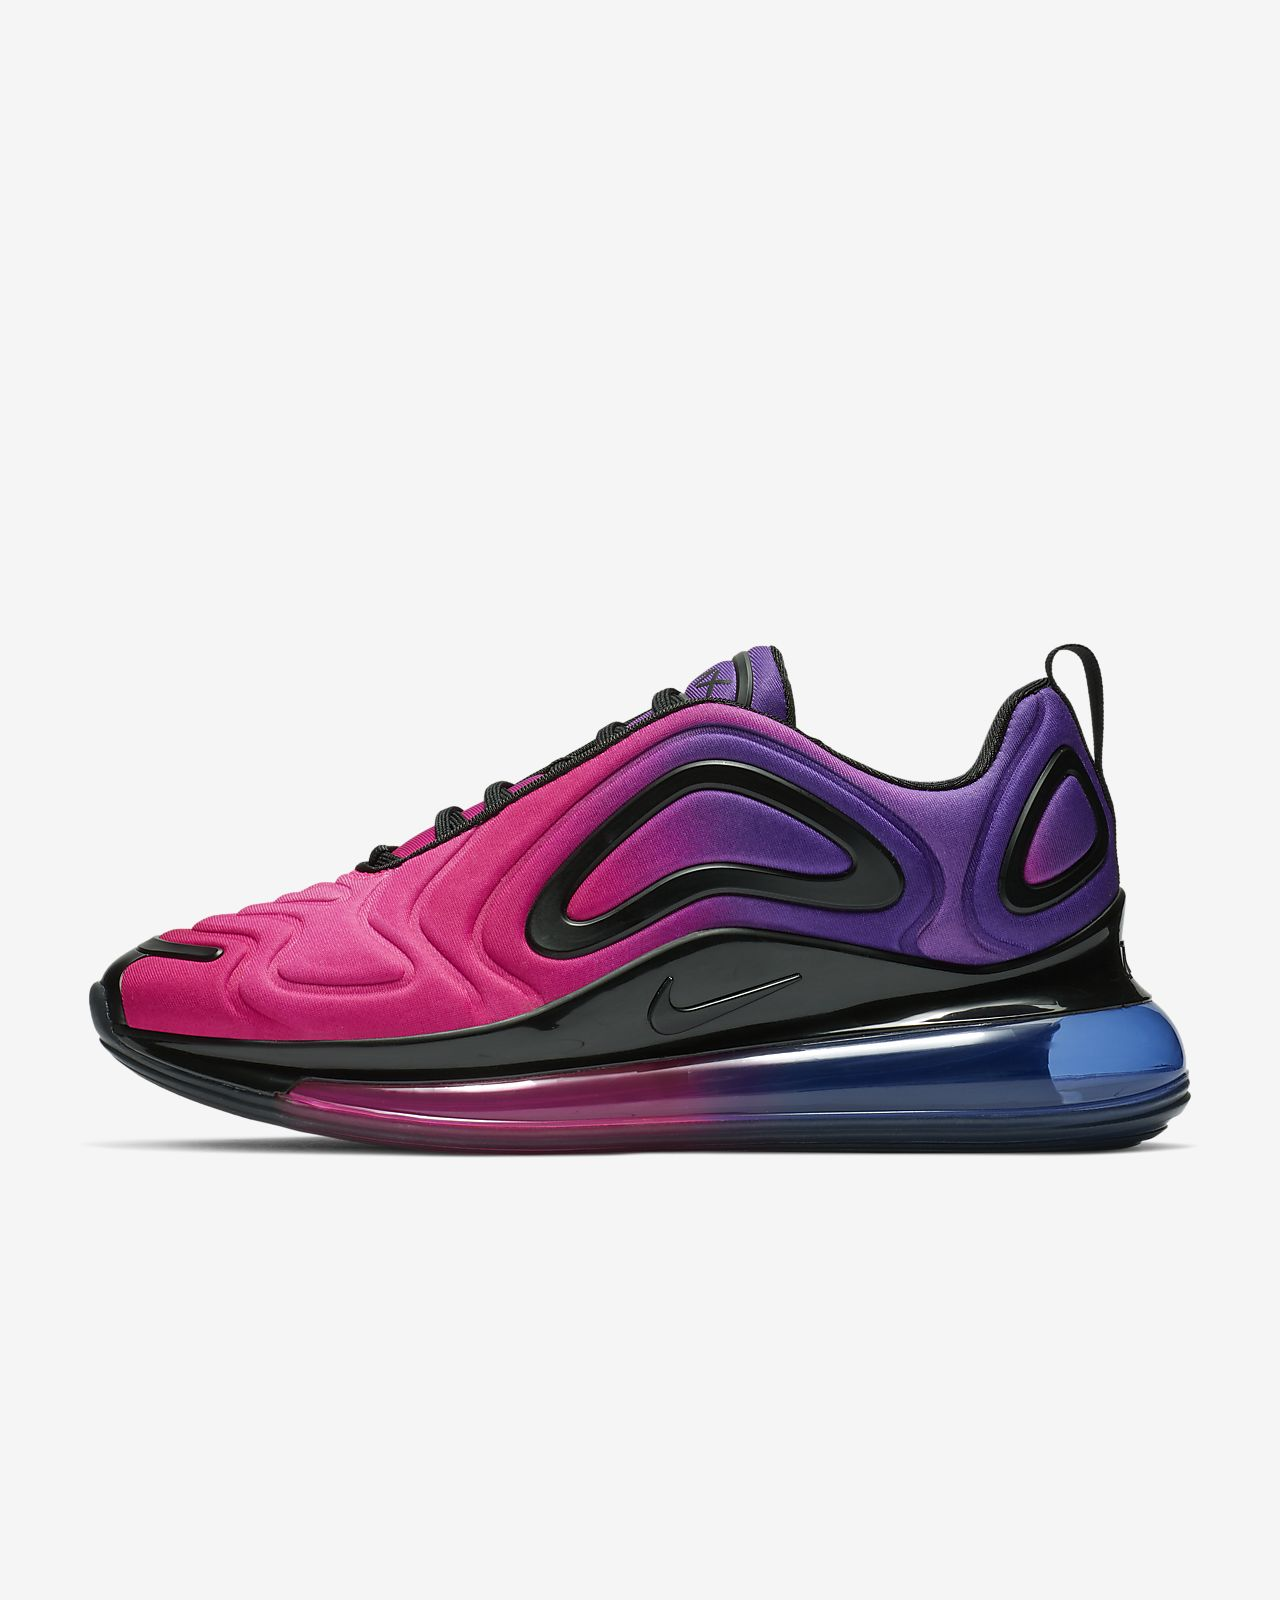 promo code fe674 bcab6 ... Chaussure Nike Air Max 720 pour Femme